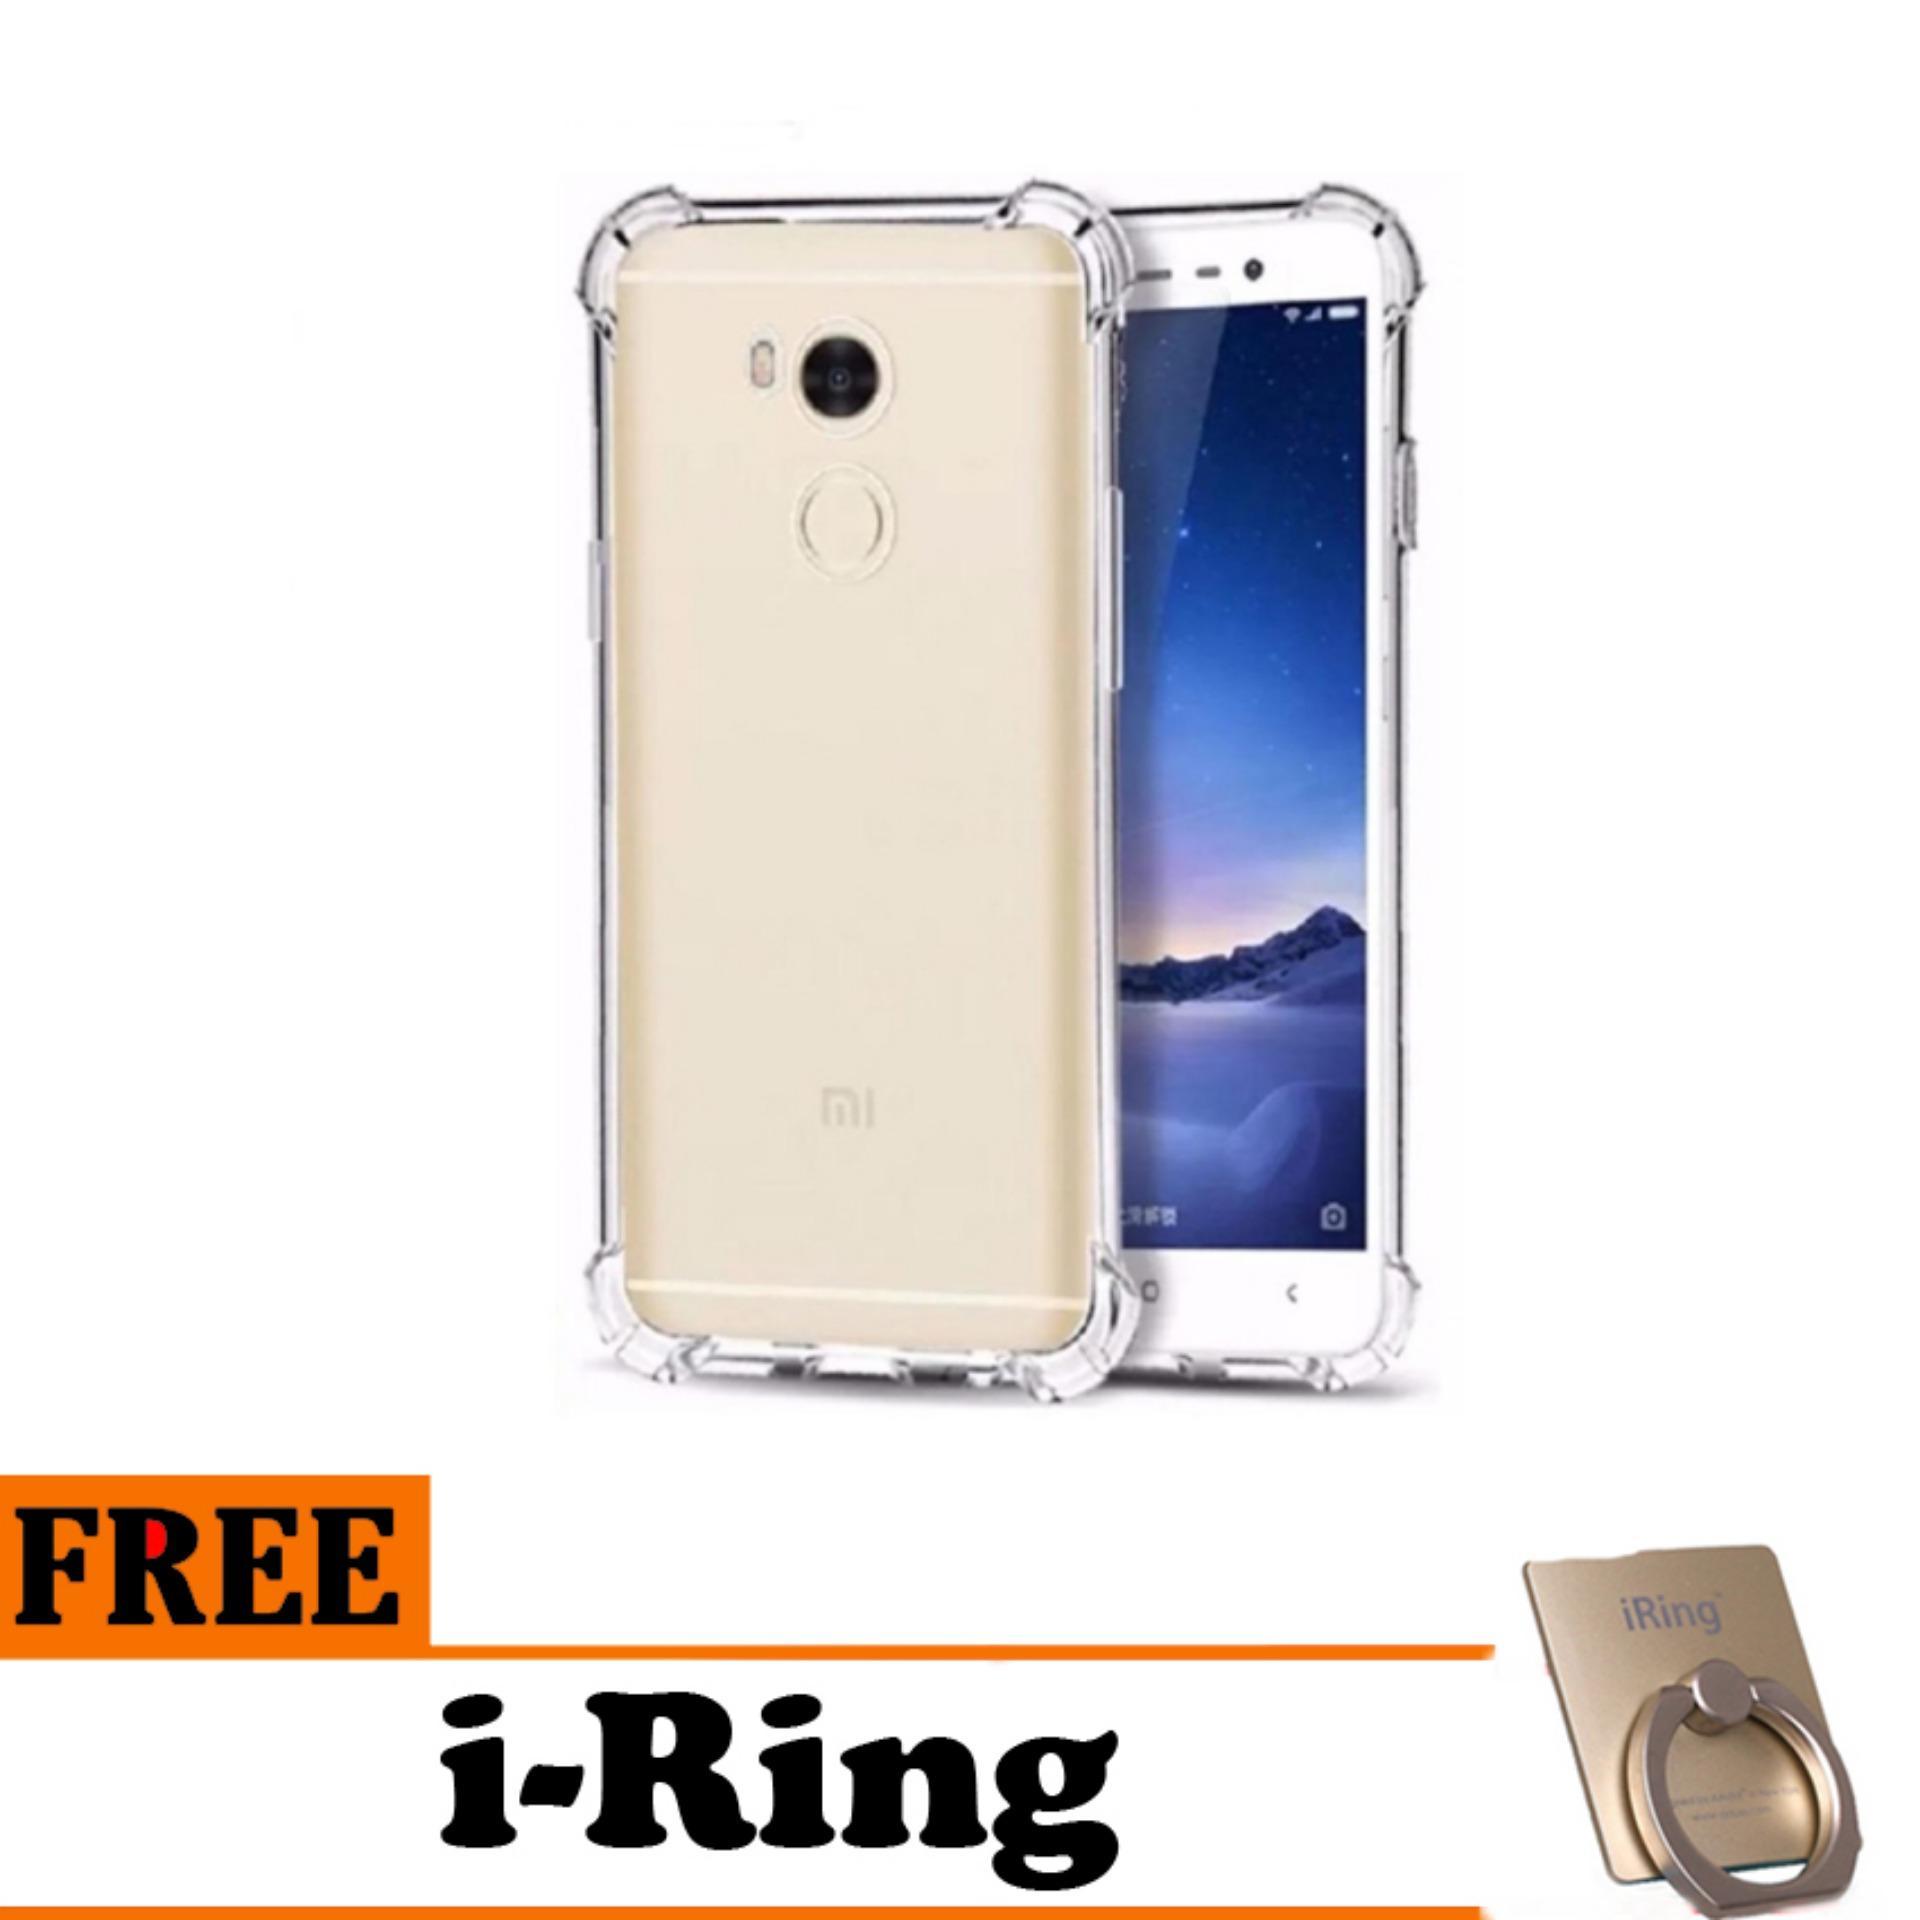 Cek Harga Baru Anti Crack Case Xiaomi Redmi 2 Prime Shock Softcase S2 Elegan For 4 Clear